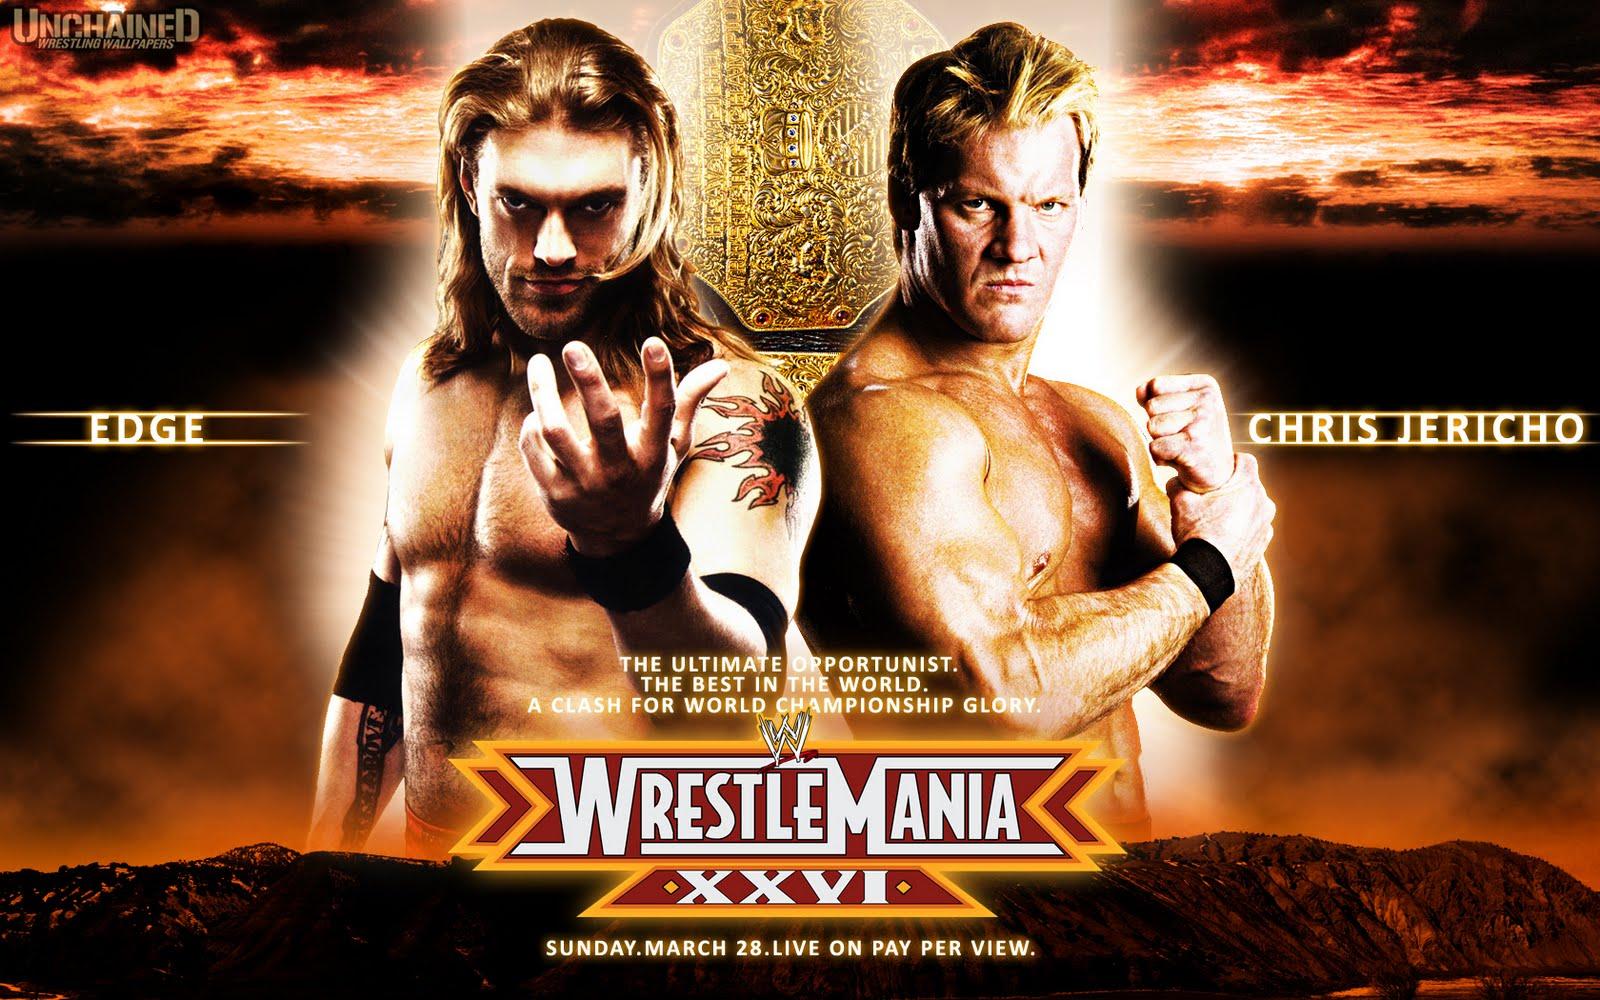 WWE Superstars | WWE Wallpapers | WWE WrestleMania: WWE- Edge 3D Pics